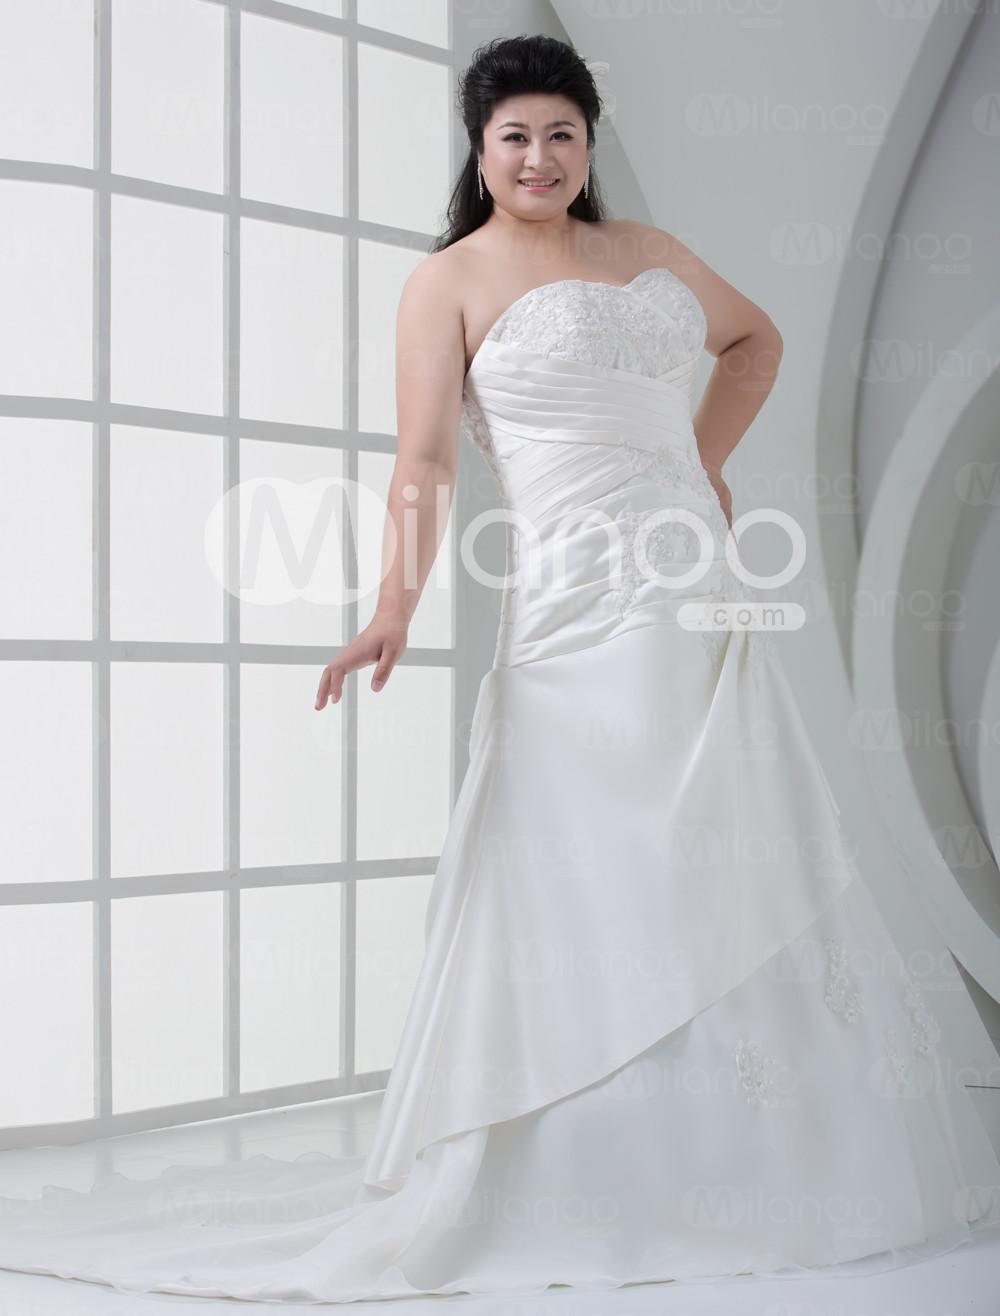 caterinafashionstyle ivory satin doux c ur organza robe